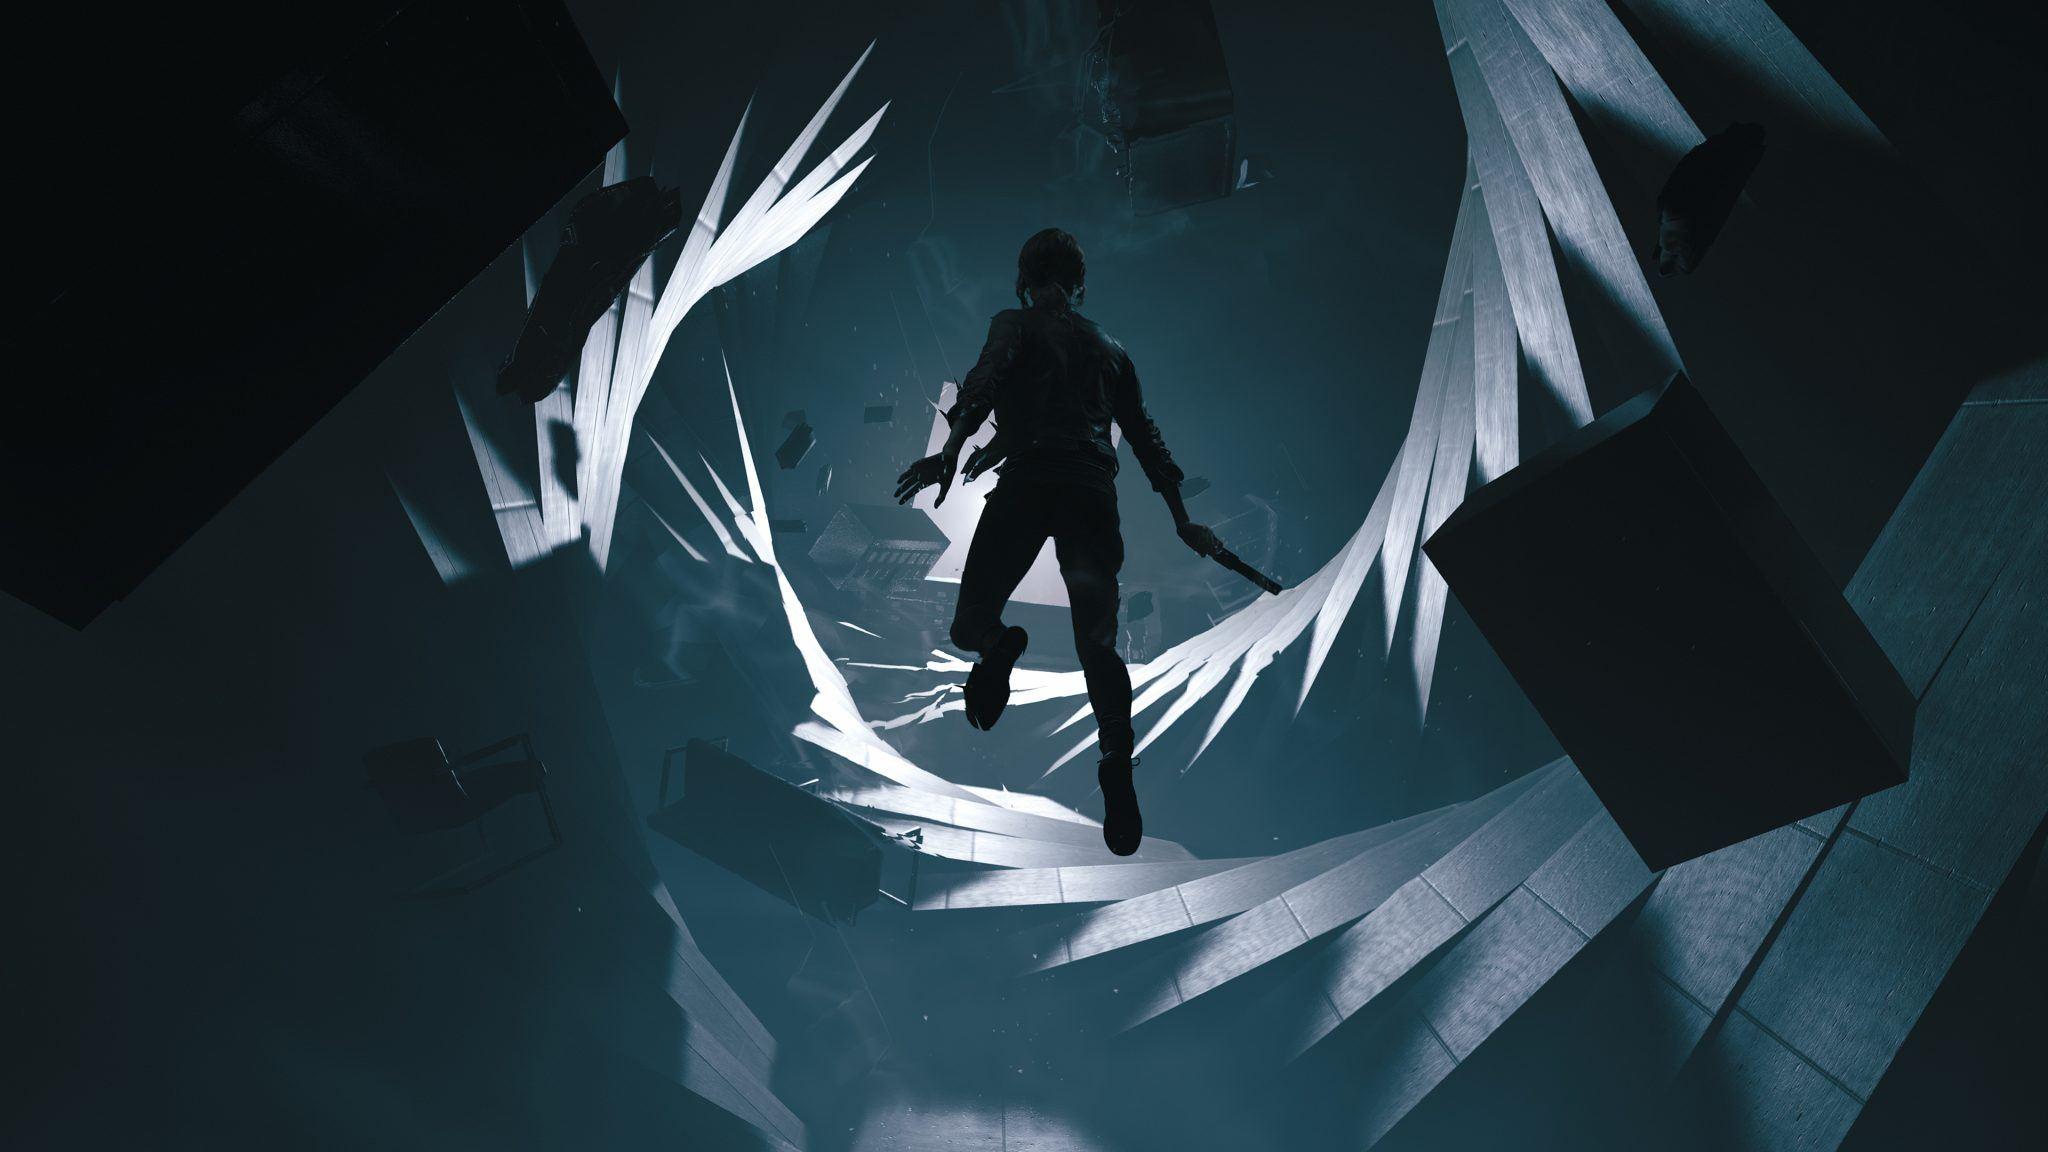 Control Jesse_levitating_tunnel